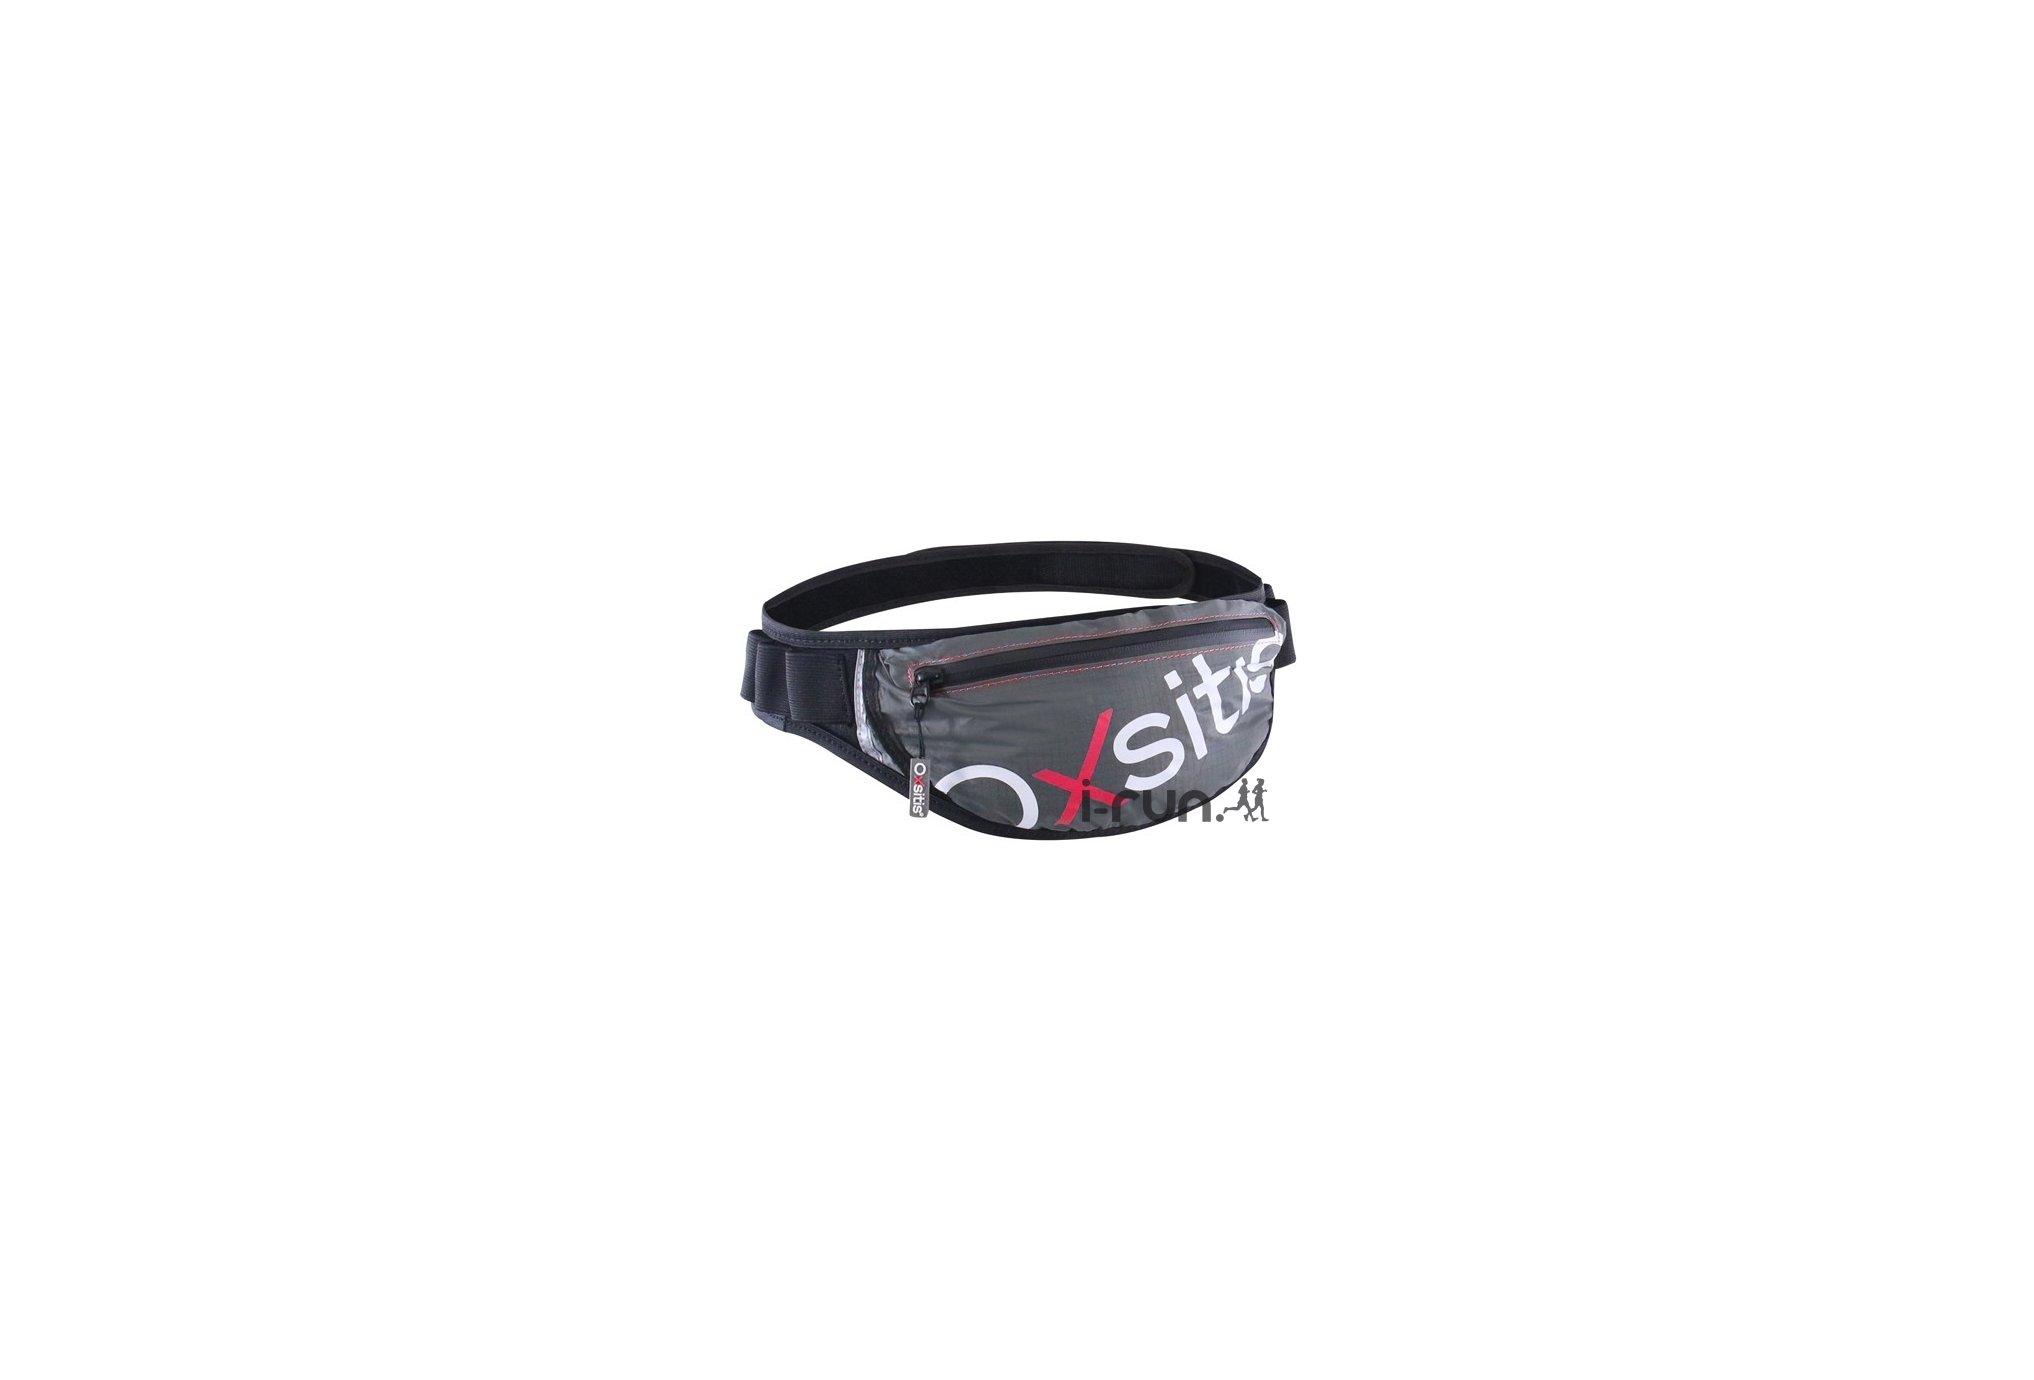 Oxsitis run belt w ceinture porte dossard